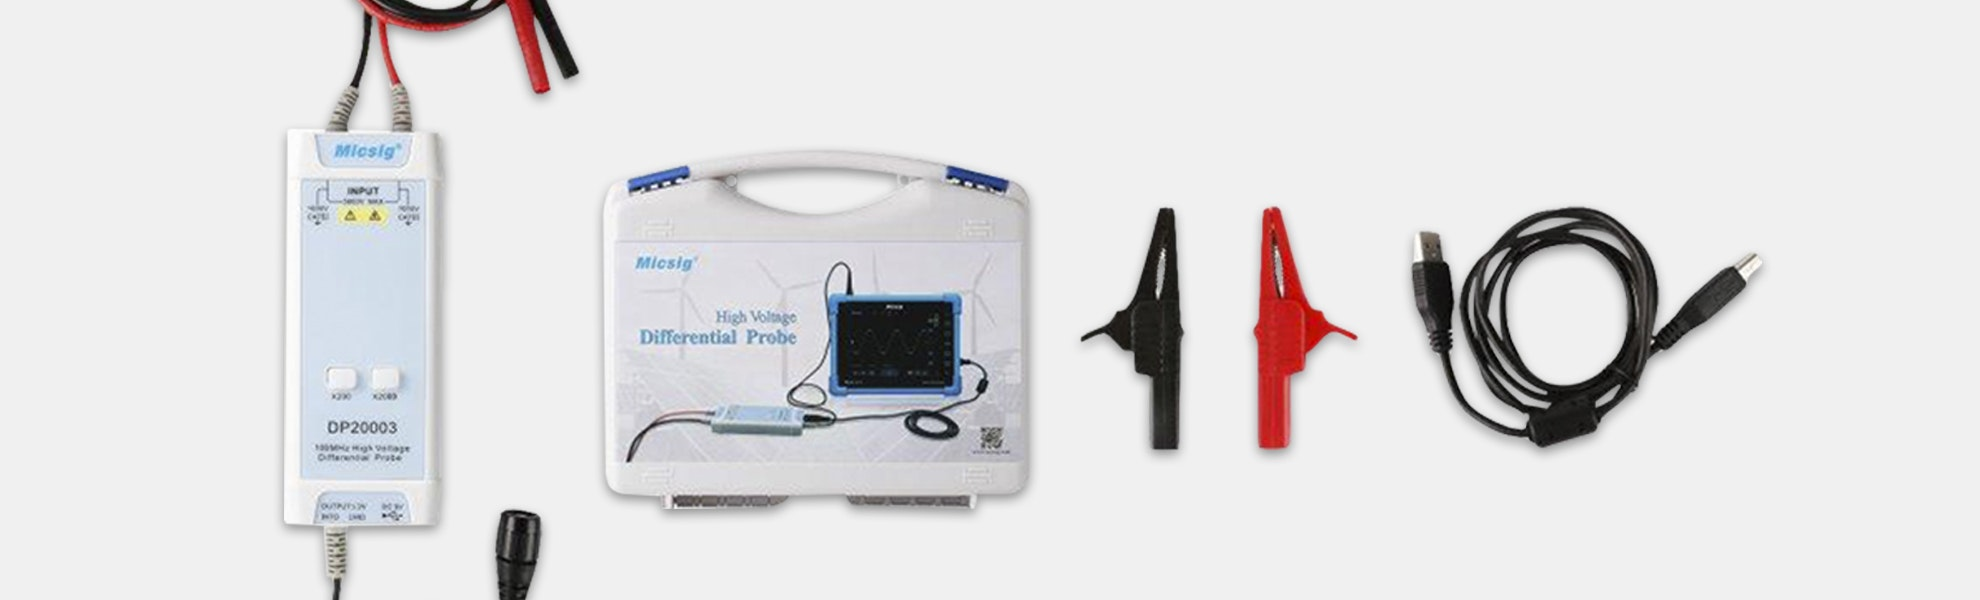 SainSmart Micsig Differential Probe Kit